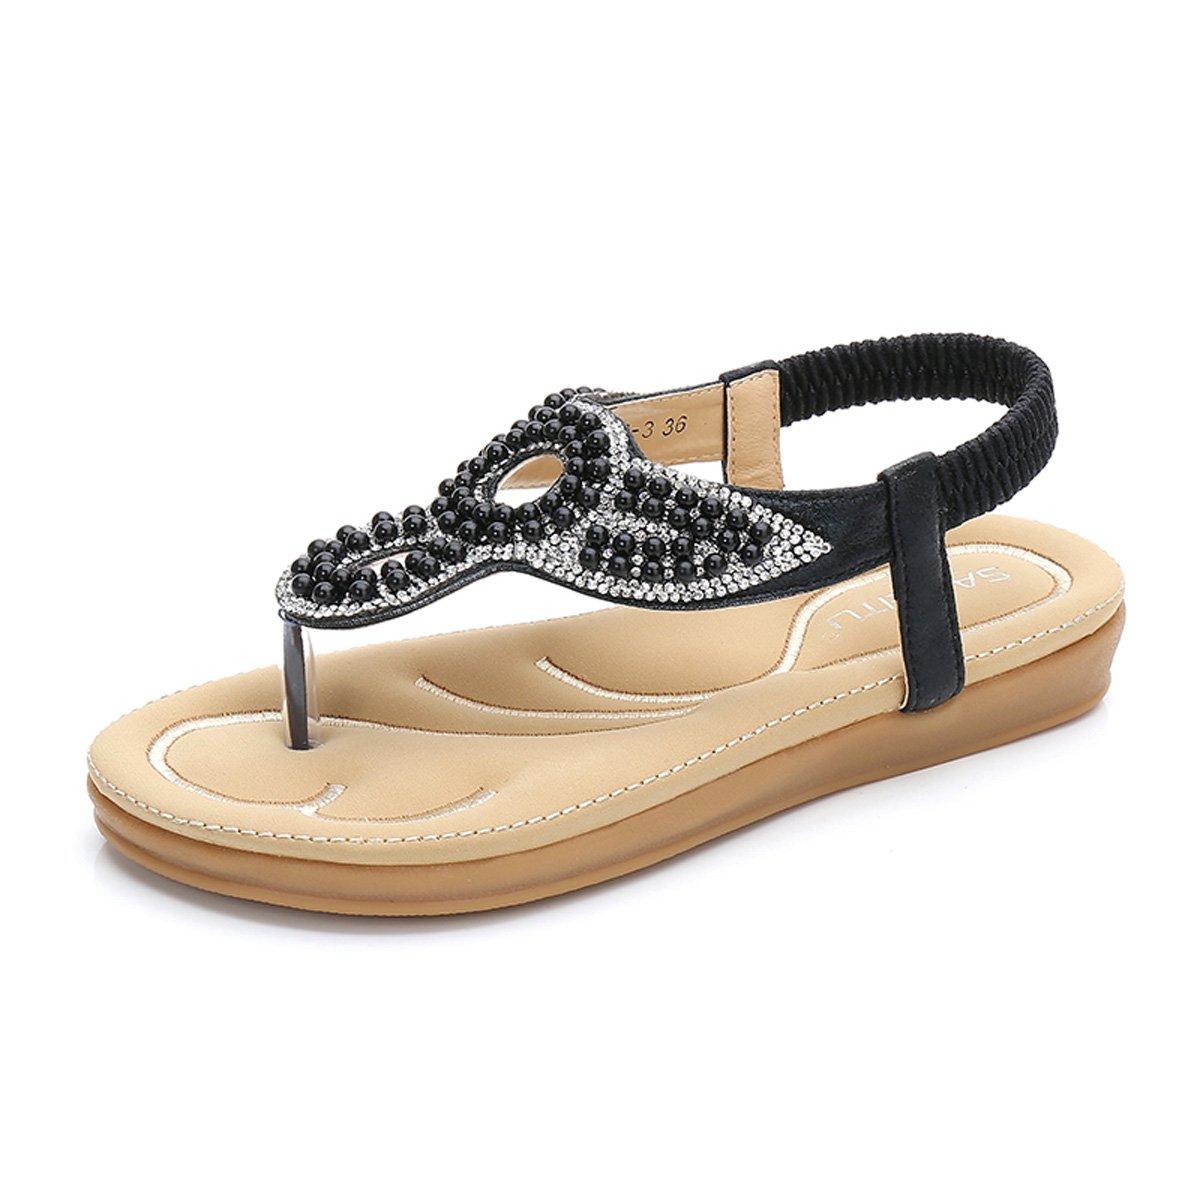 gracosy Damen Sandalen, Flip Flops Sommer Sandals Flach Zehentrenner T-Strap Offen Bouml;hmische Strand Schuhe  39 EU|Schwarz-d